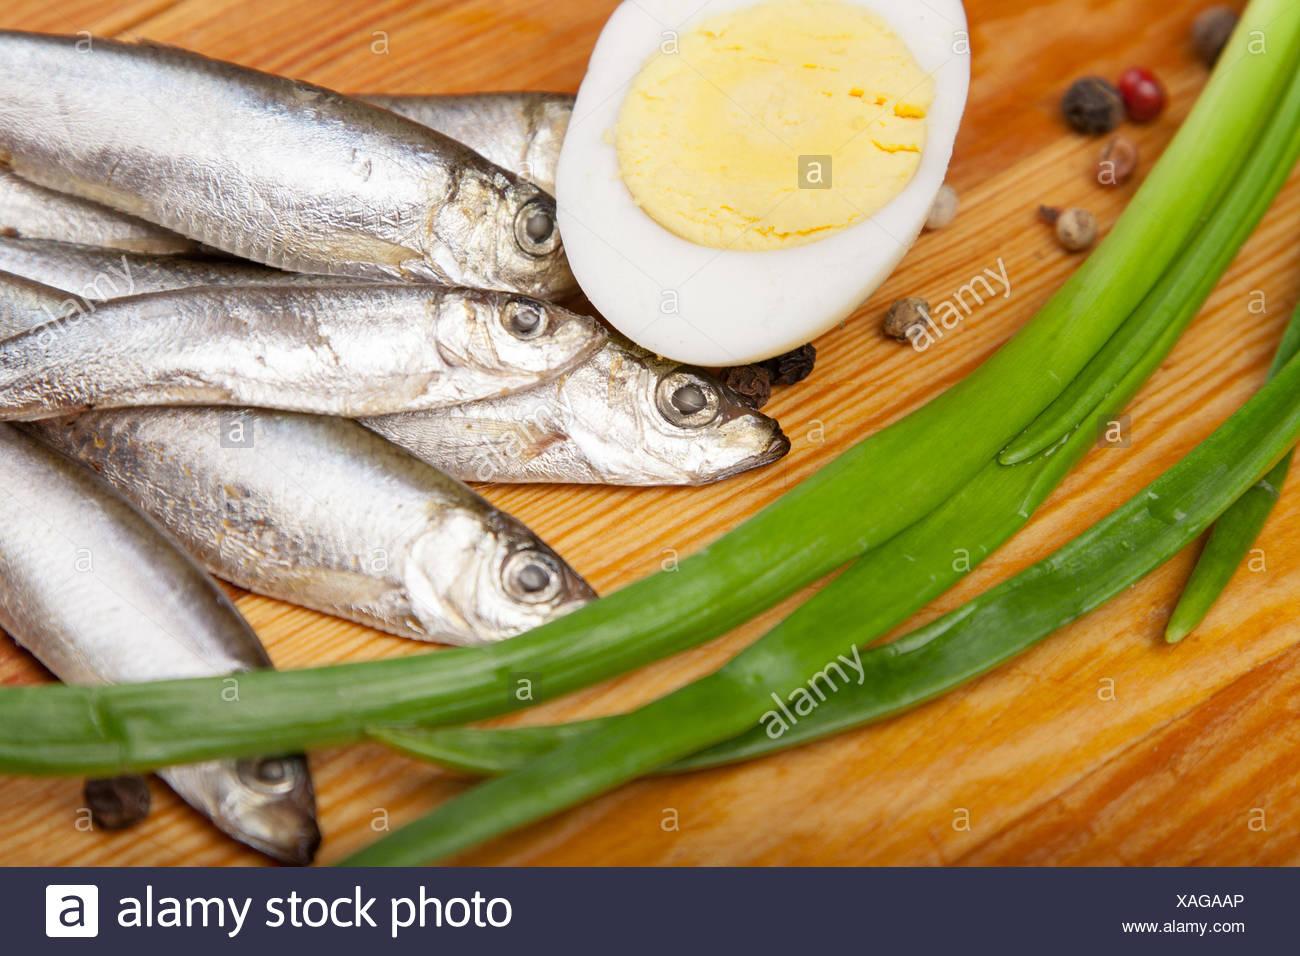 food aliment salt pepper wood shell silver freshness small tiny little short spring bouncing bounces hop skipping frisks - Stock Image